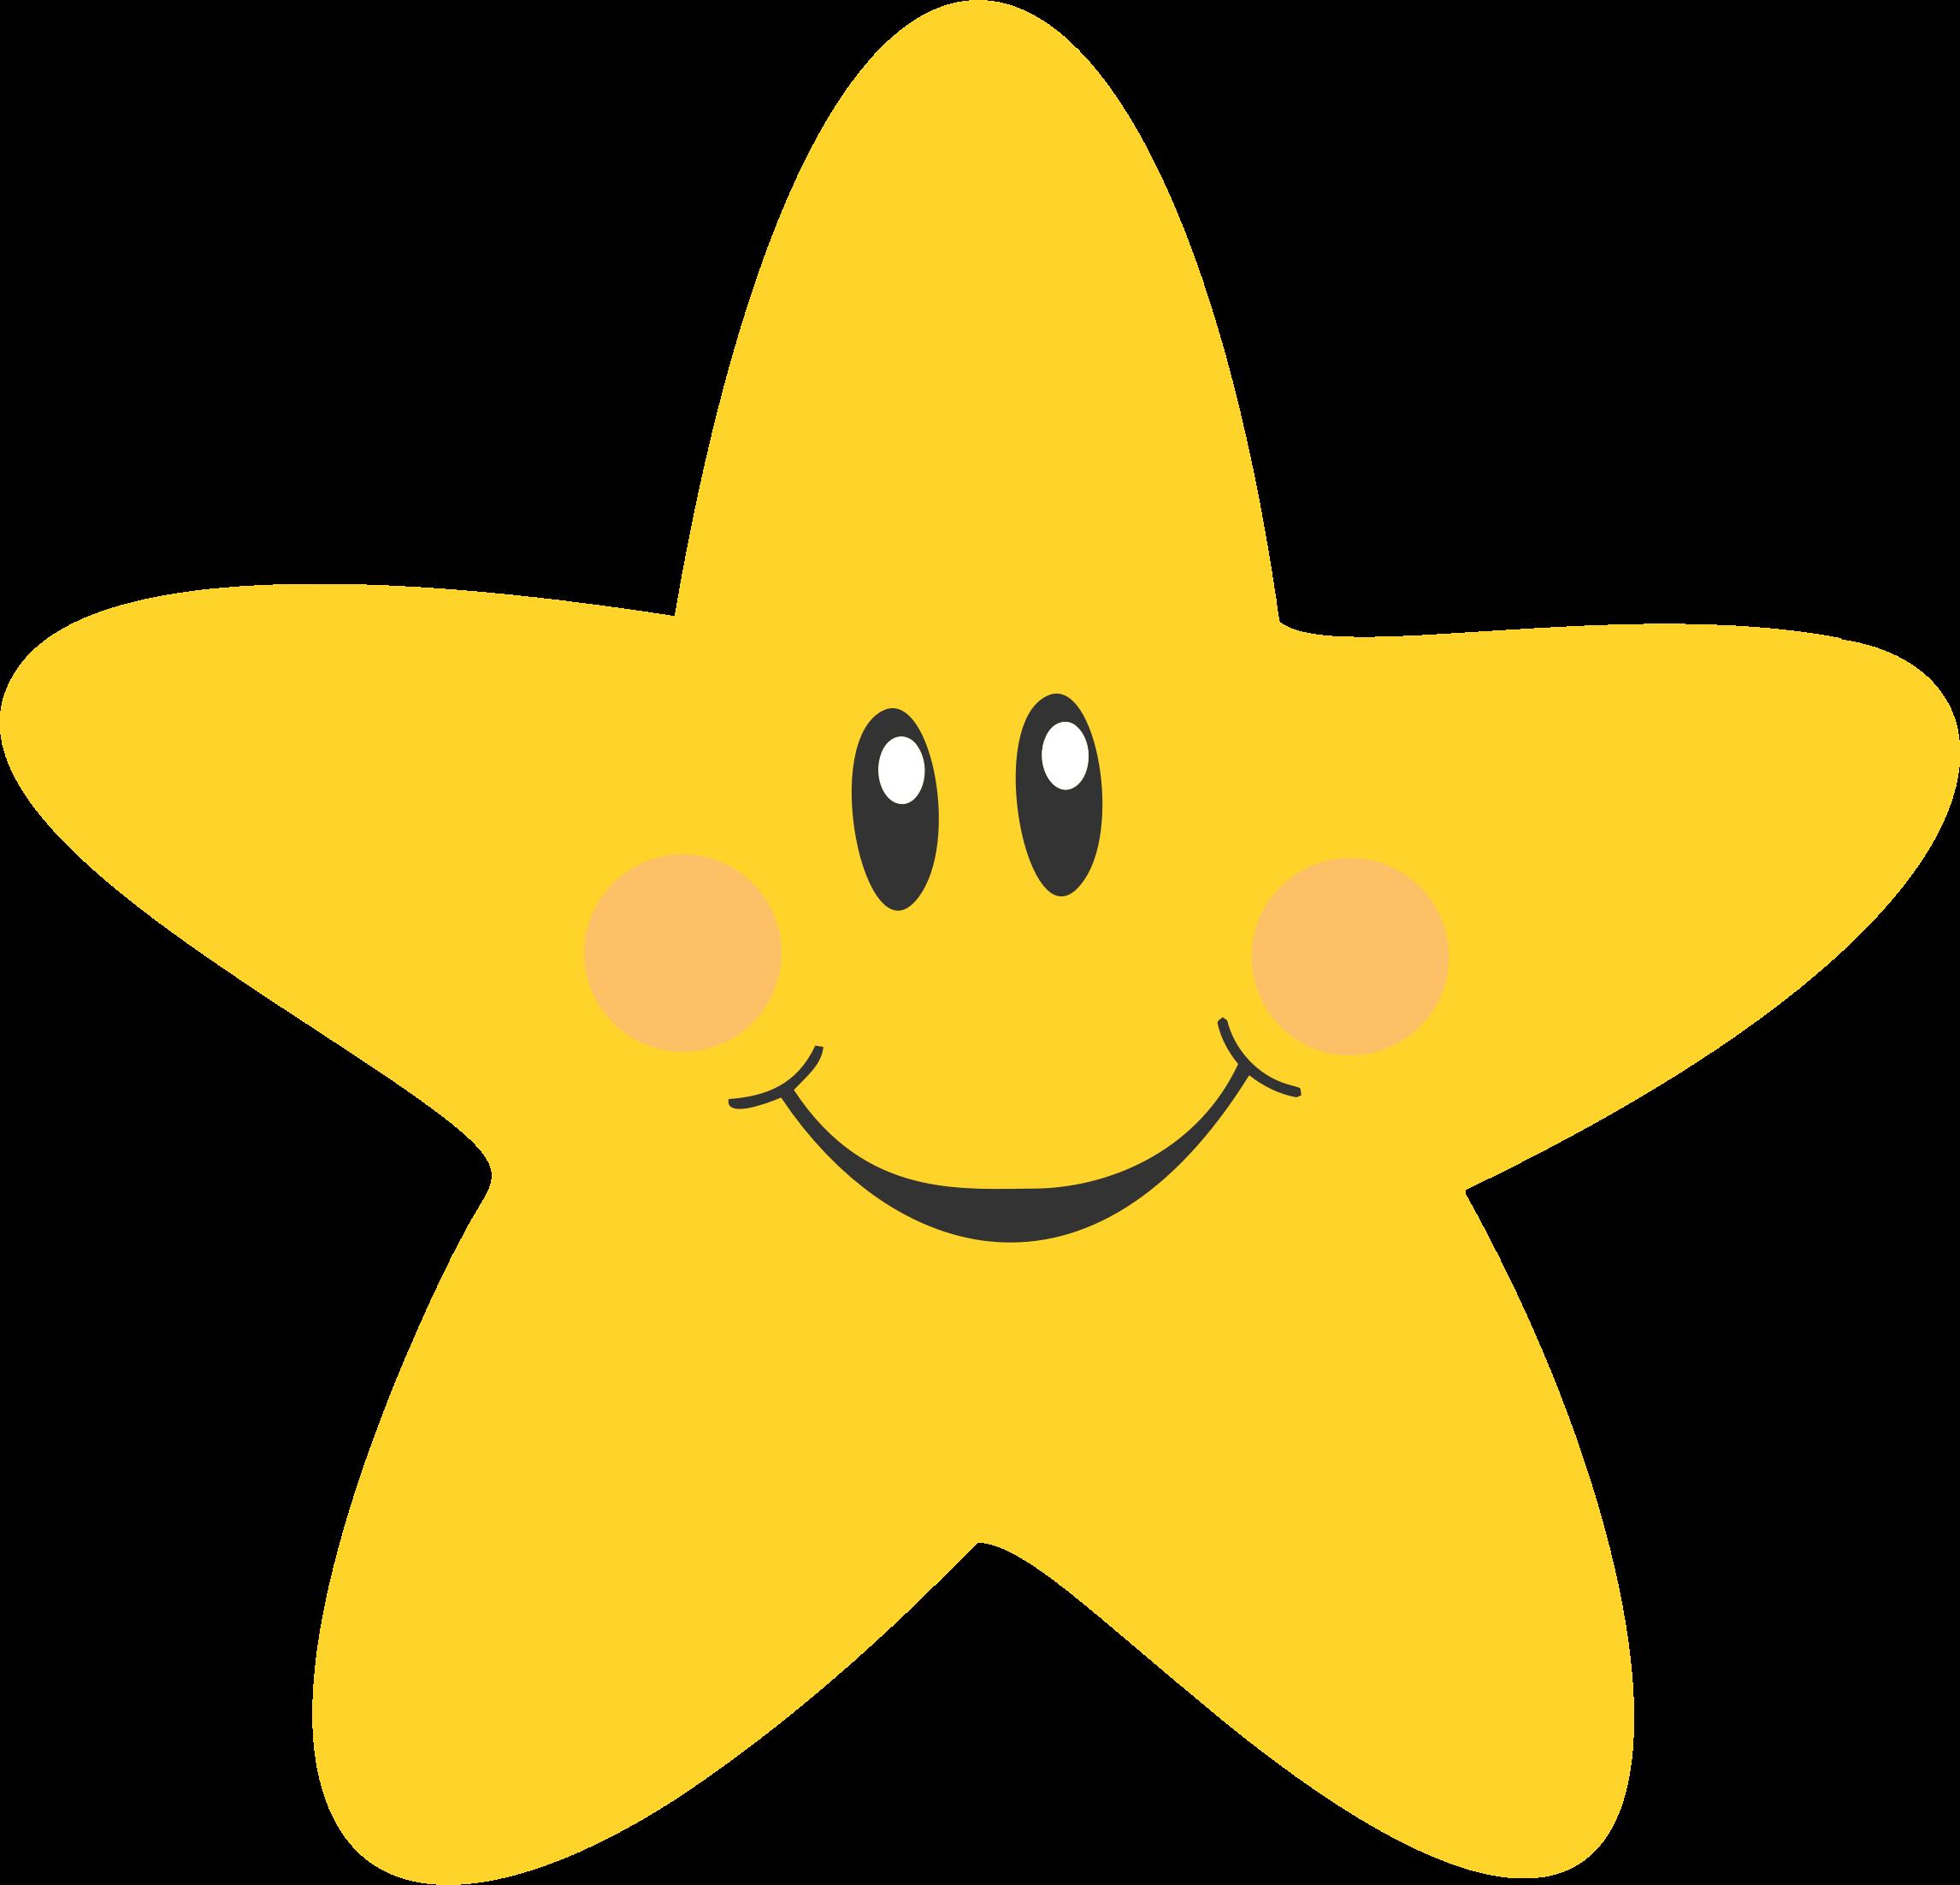 Sad clipart bucket. Smiling star big image